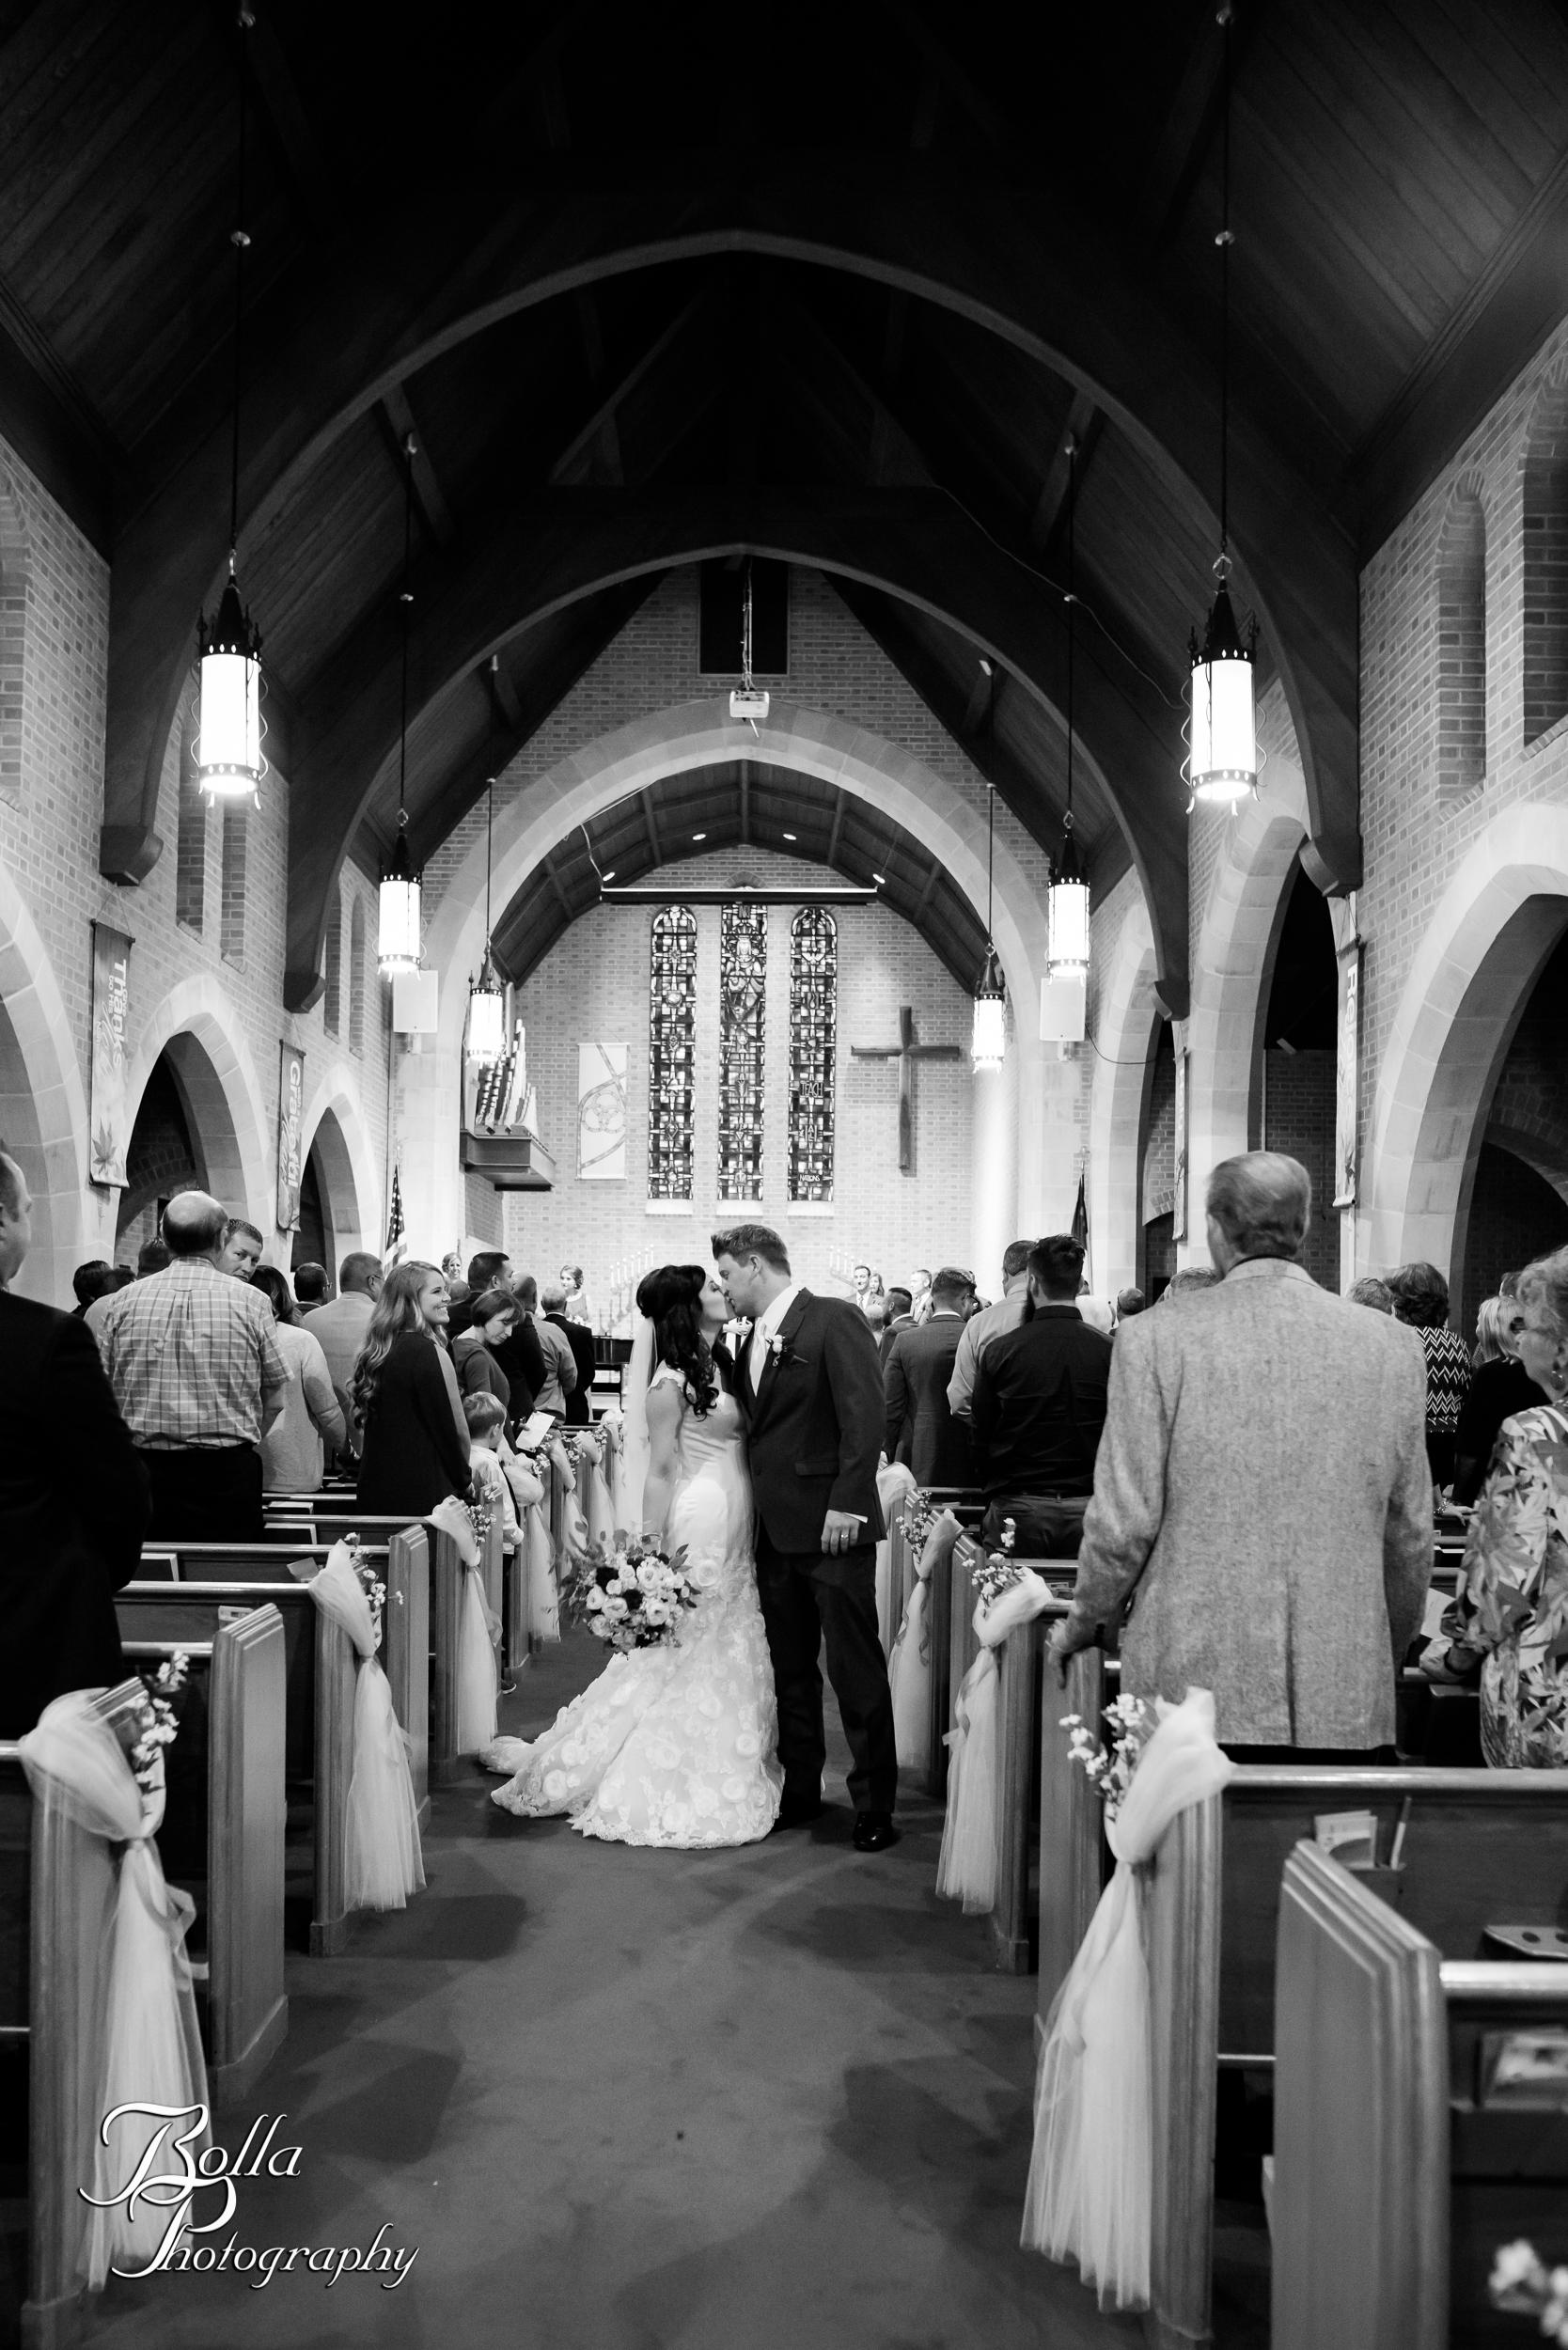 Bolla_photography_edwardsville_wedding_photographer_st_louis_weddings_Reilmann-0200.jpg